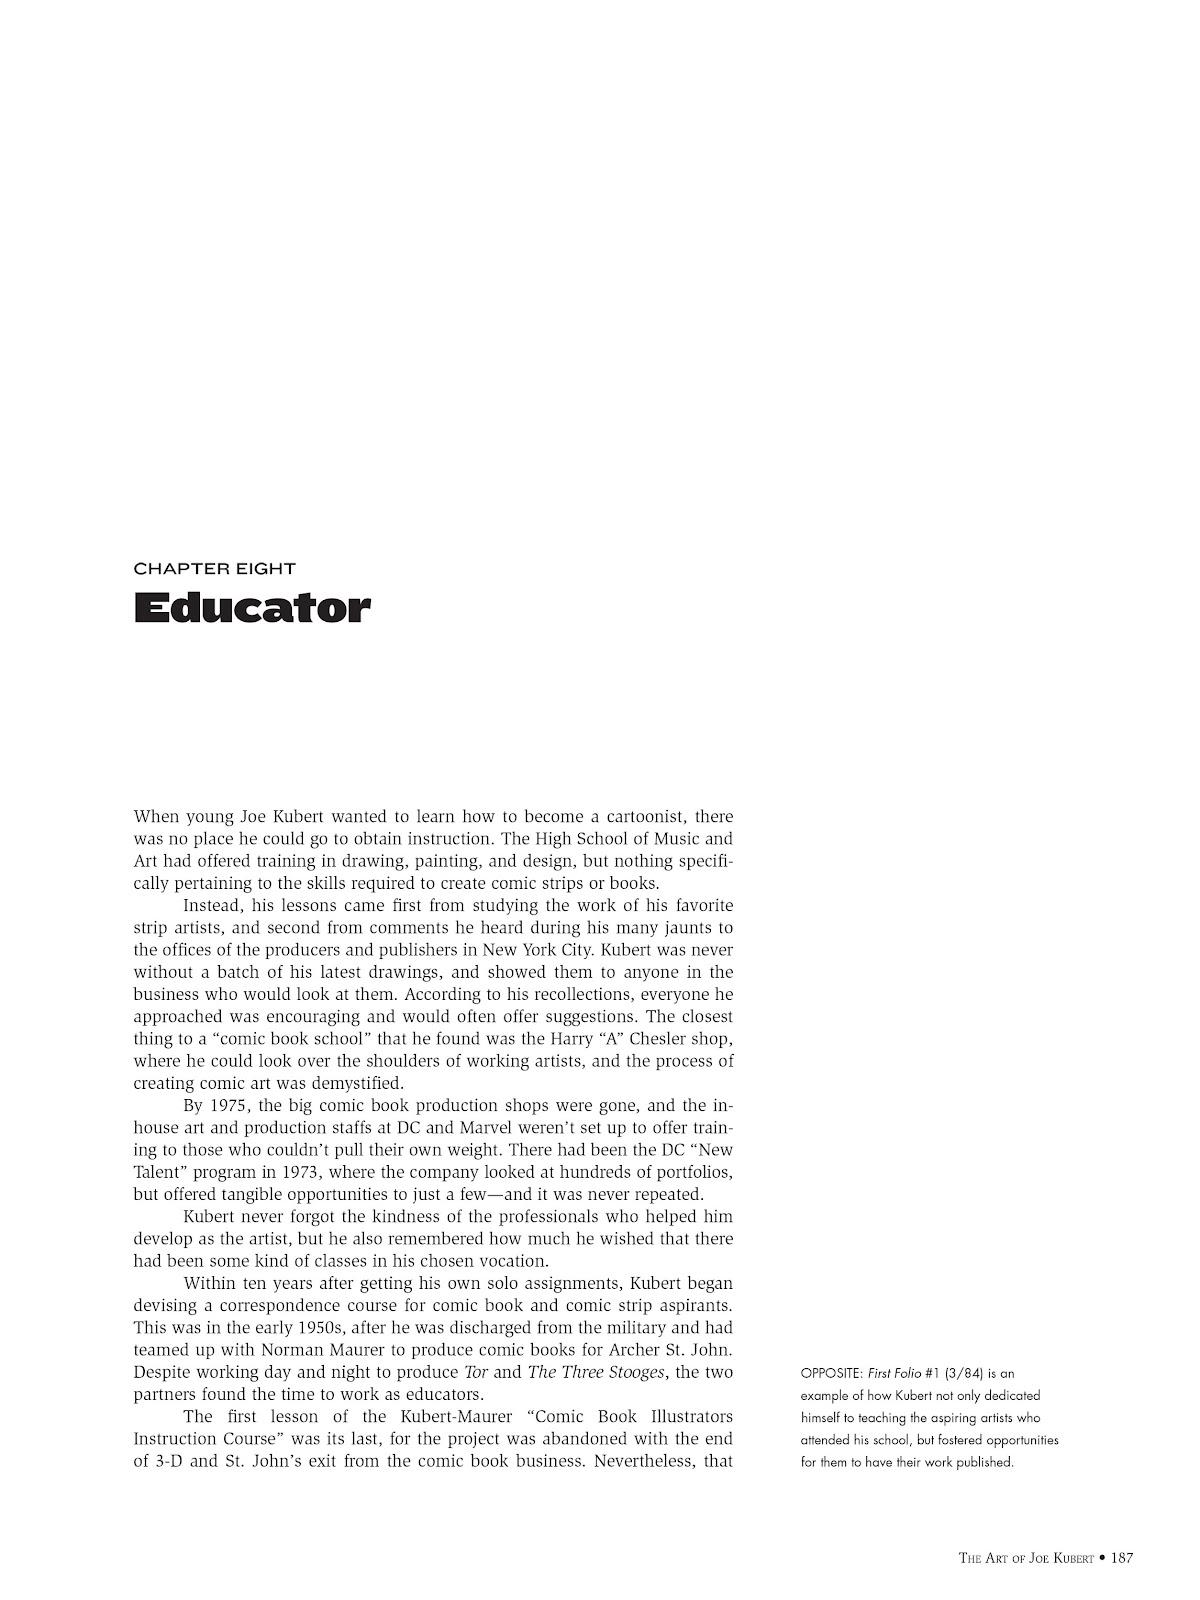 Read online The Art of Joe Kubert comic -  Issue # TPB (Part 2) - 87